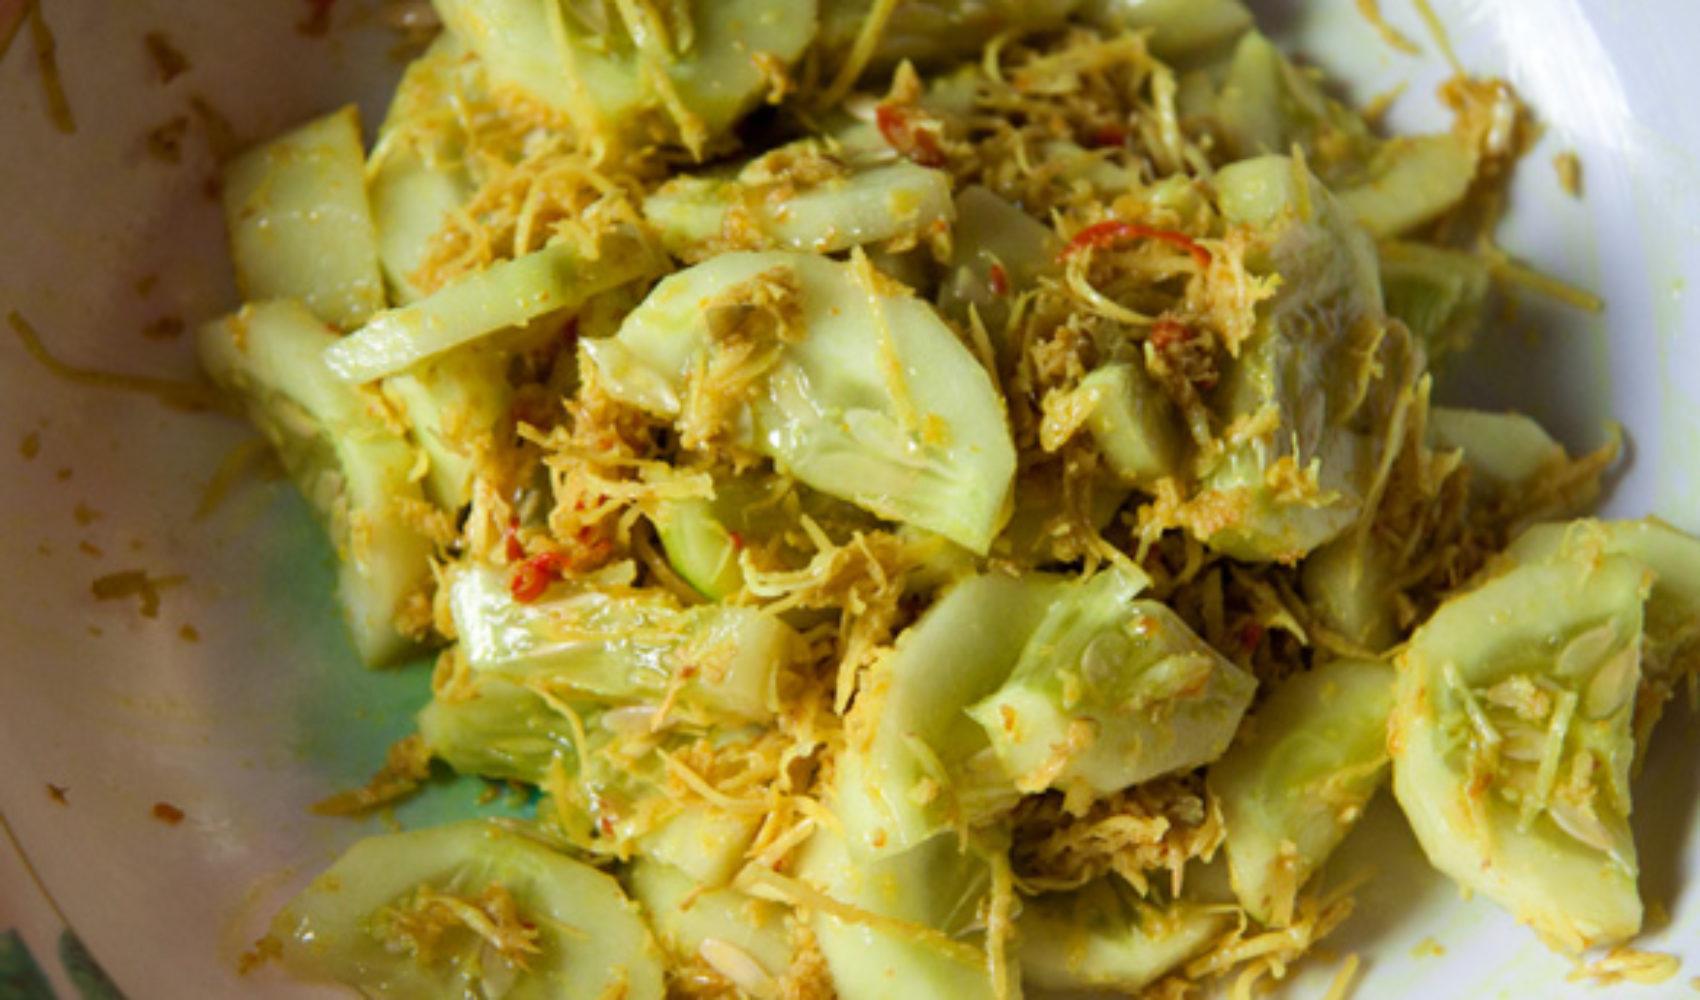 Bali III: Die Rezepte - Urap Timun - indonesischer Gurkensalat